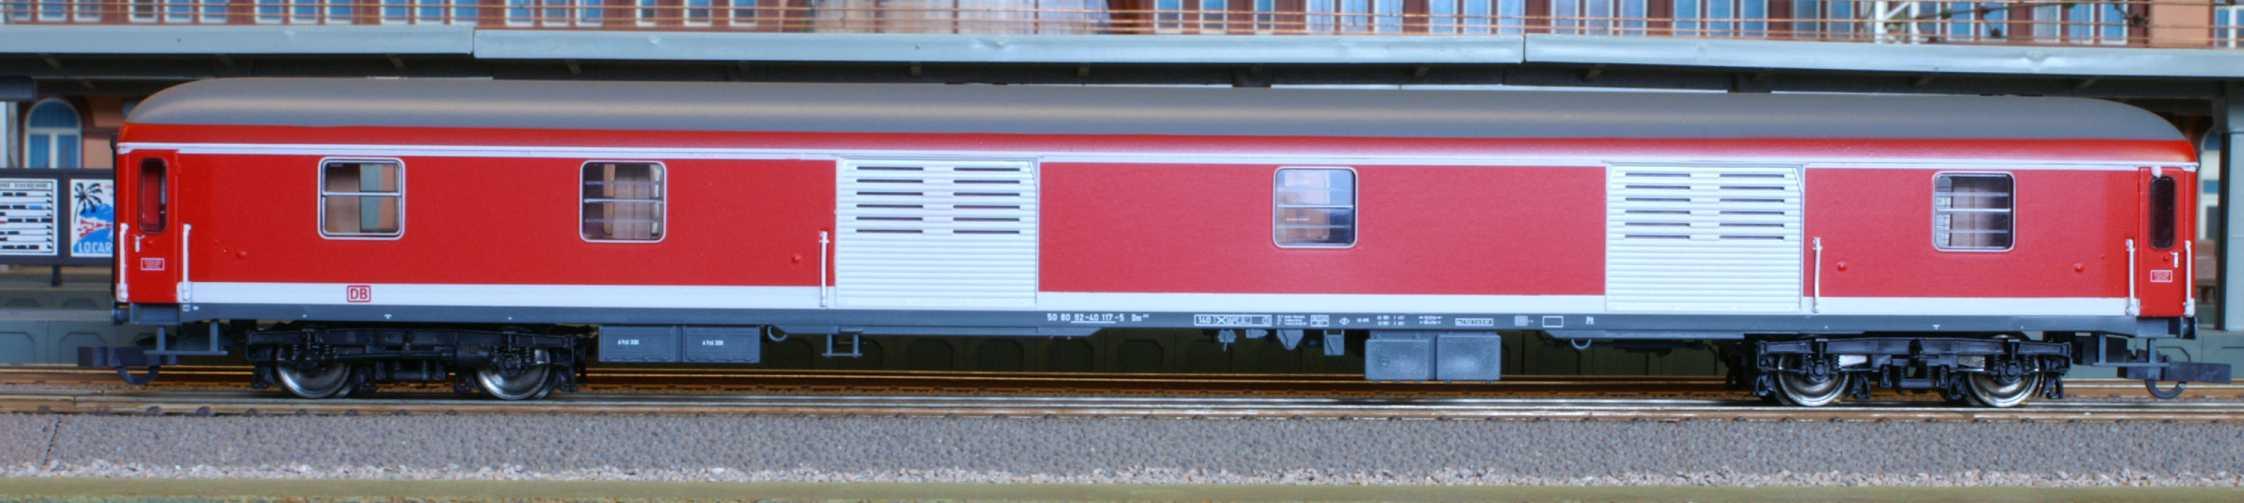 Roco 45275 - 920 Dm, IC Verkehrsrot, Gepaeckwagen, Rollos hellgrauDB AG-Keks.2